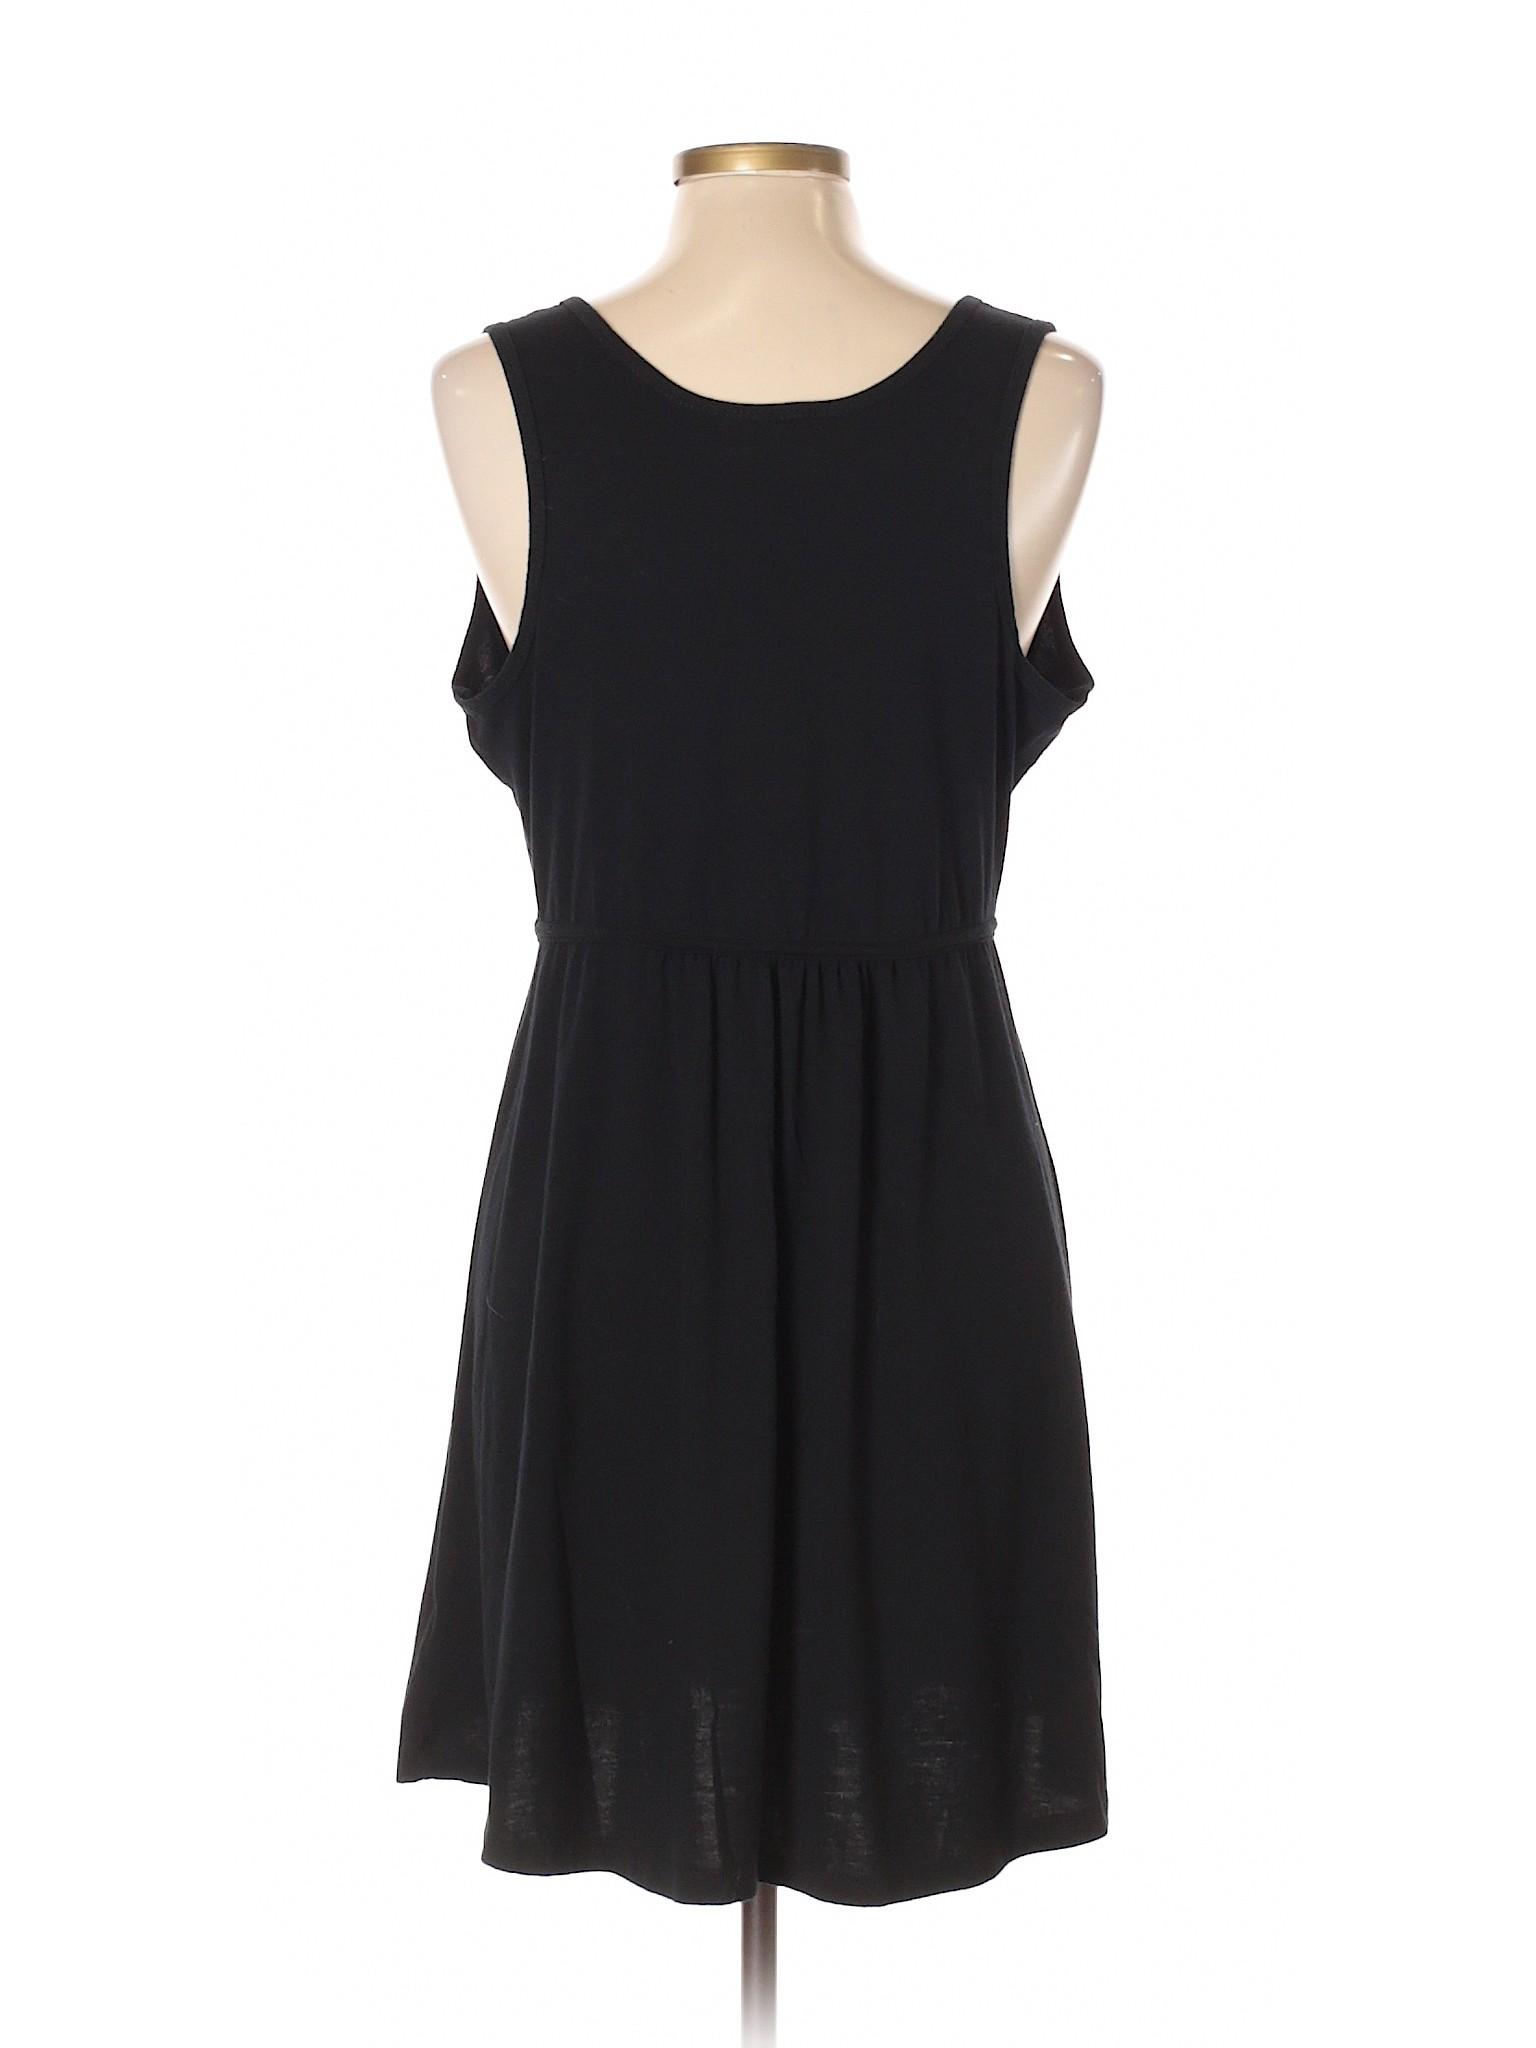 Apt winter Dress Casual 9 Boutique O5wqpzn